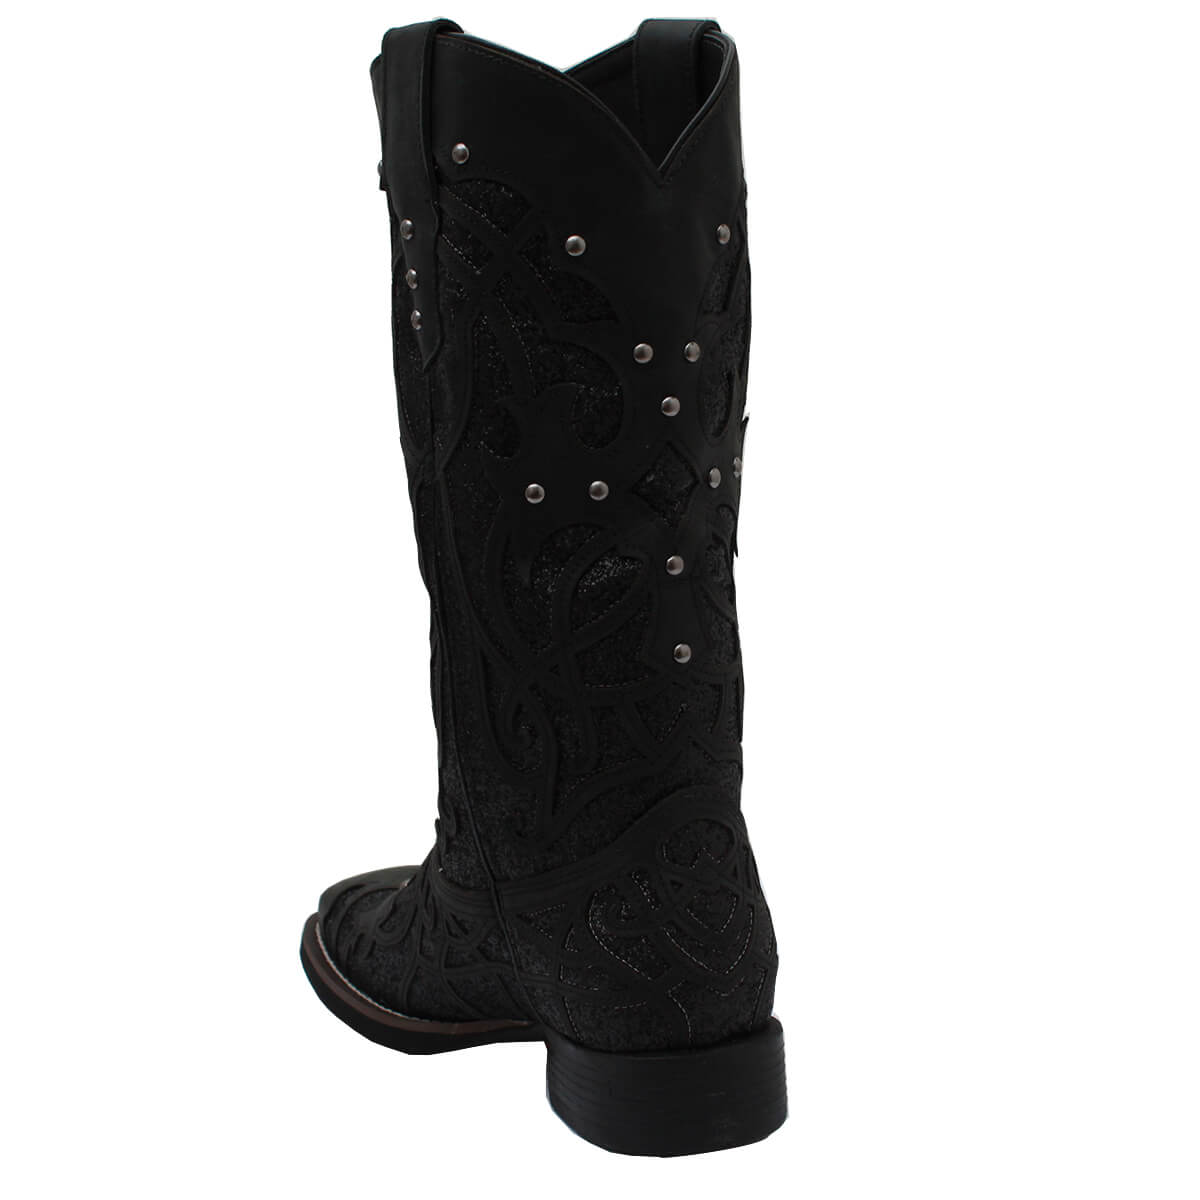 Bota Vimar Boots Feminina Fossil Preta Brilho